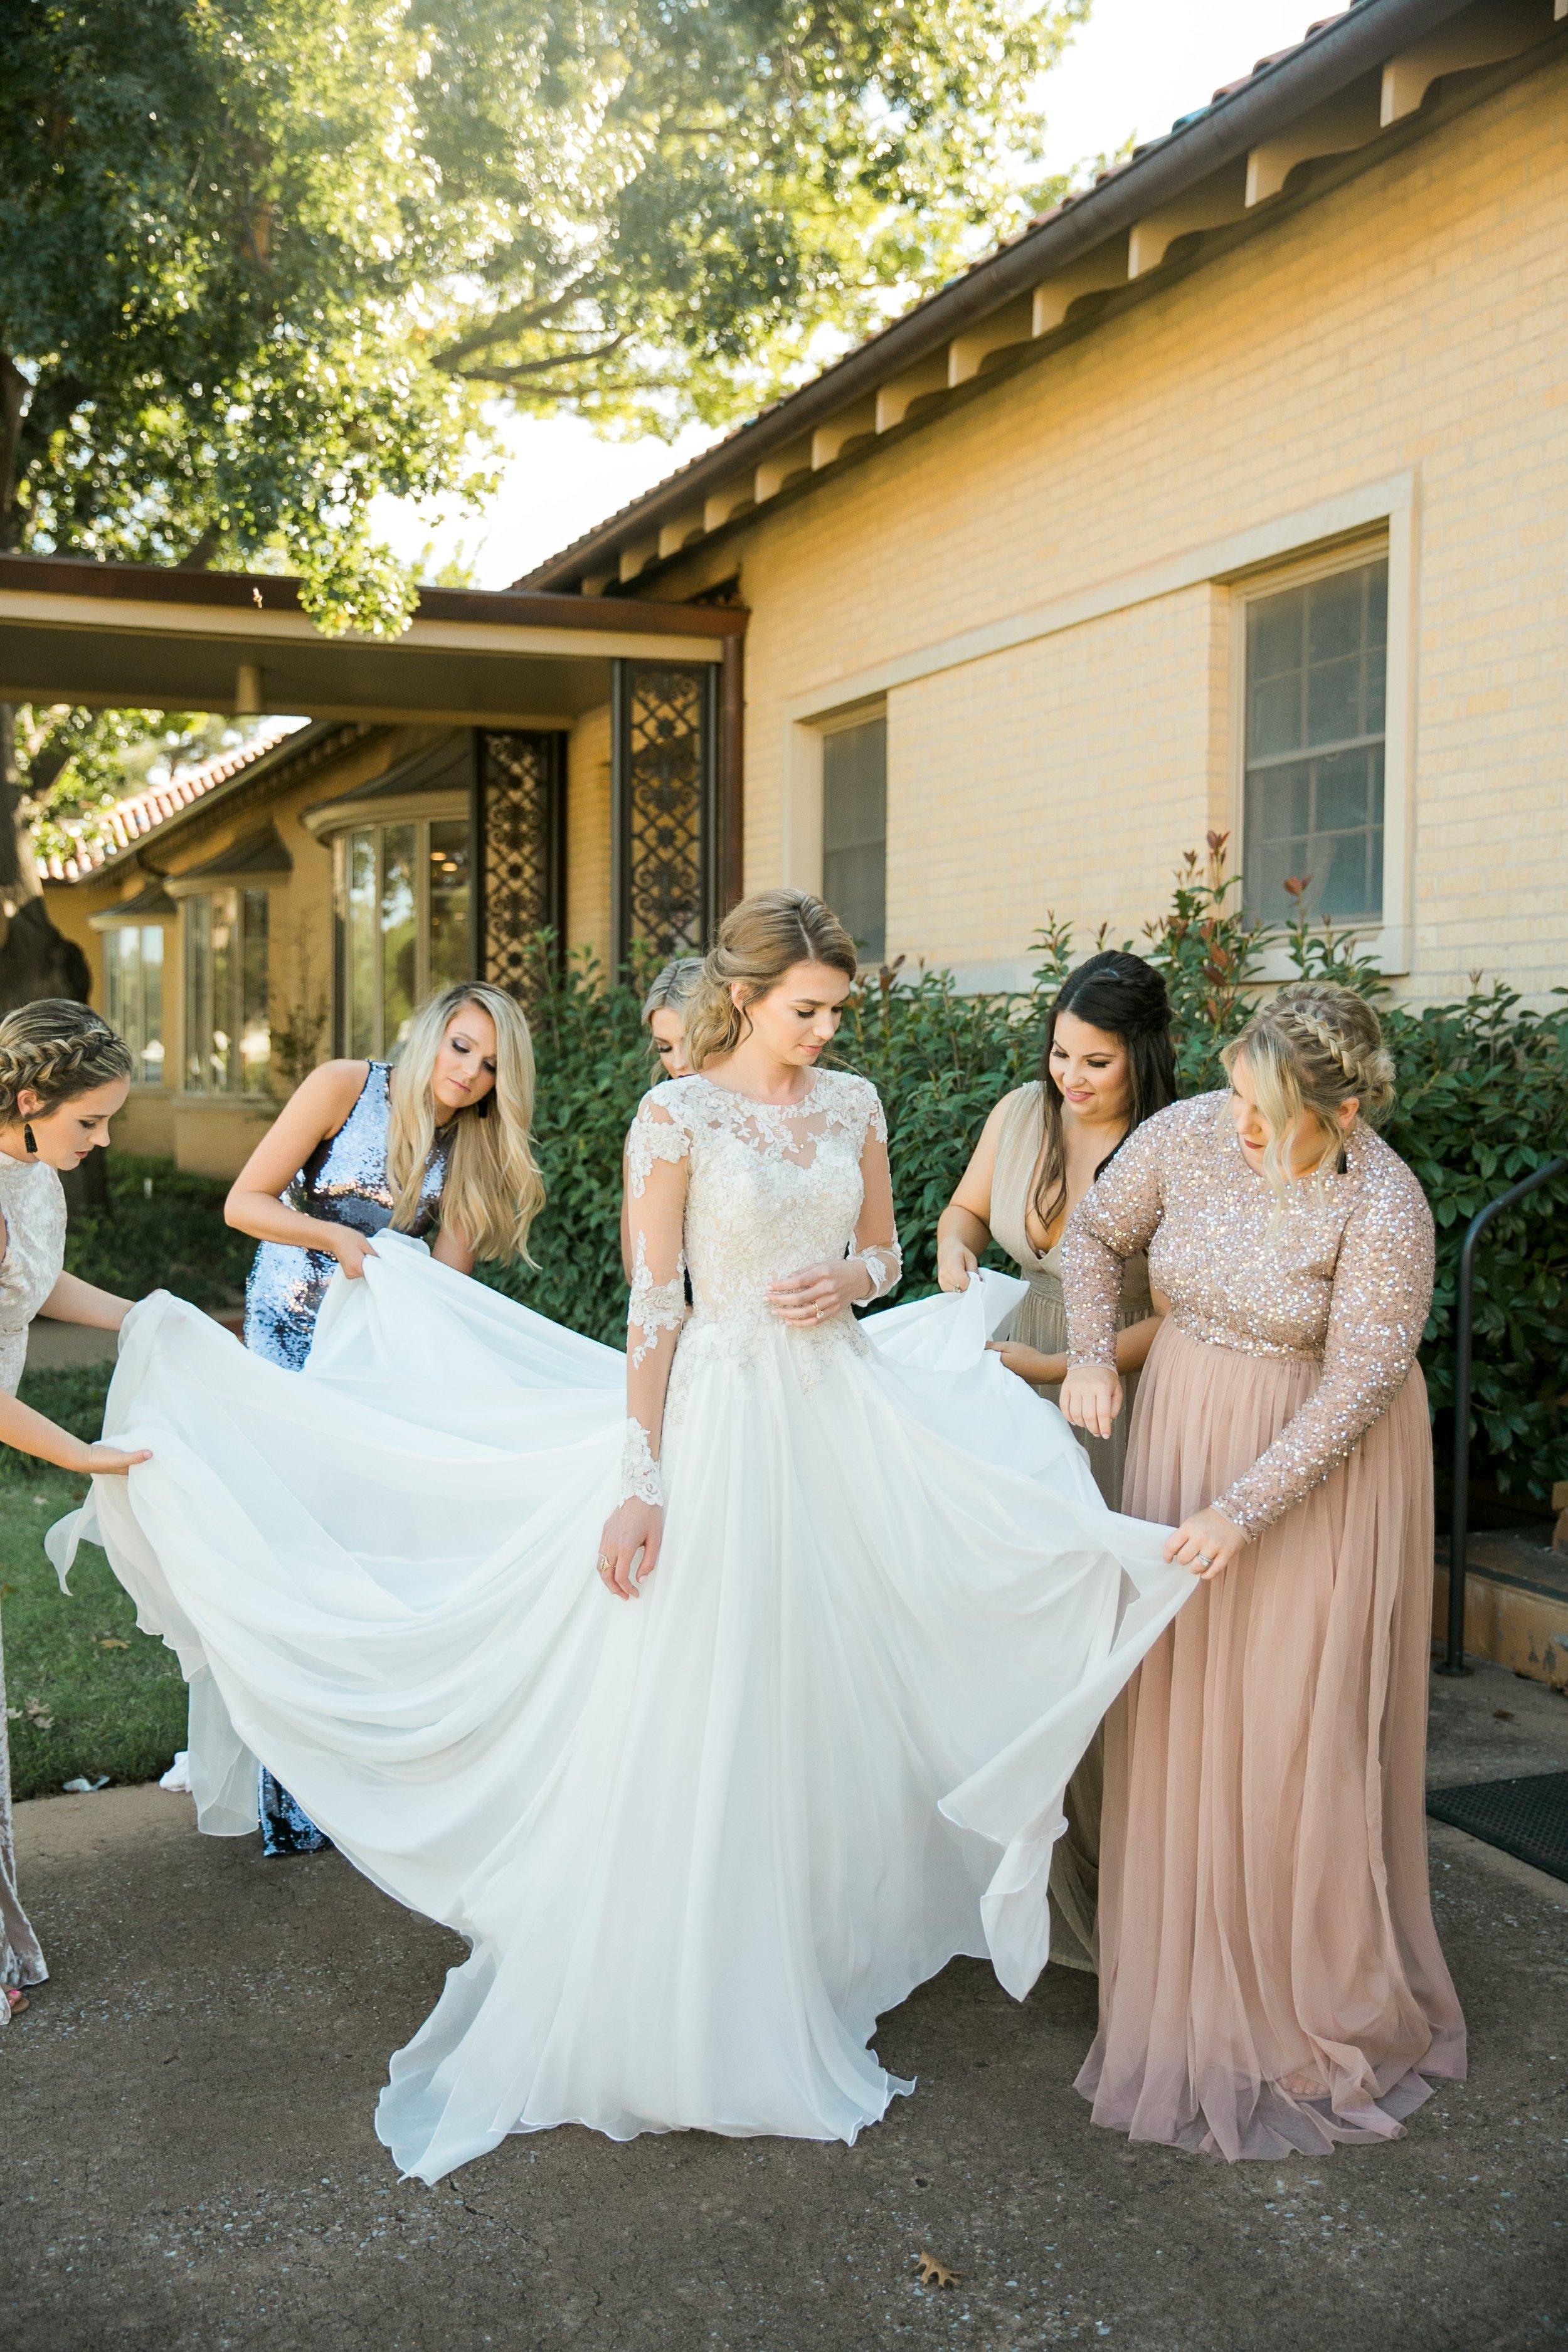 Roberson-Wedding-The-Forum-Lauren-Pinson-Wedding-Photography-Wichita-Falls-Texas-017.jpg